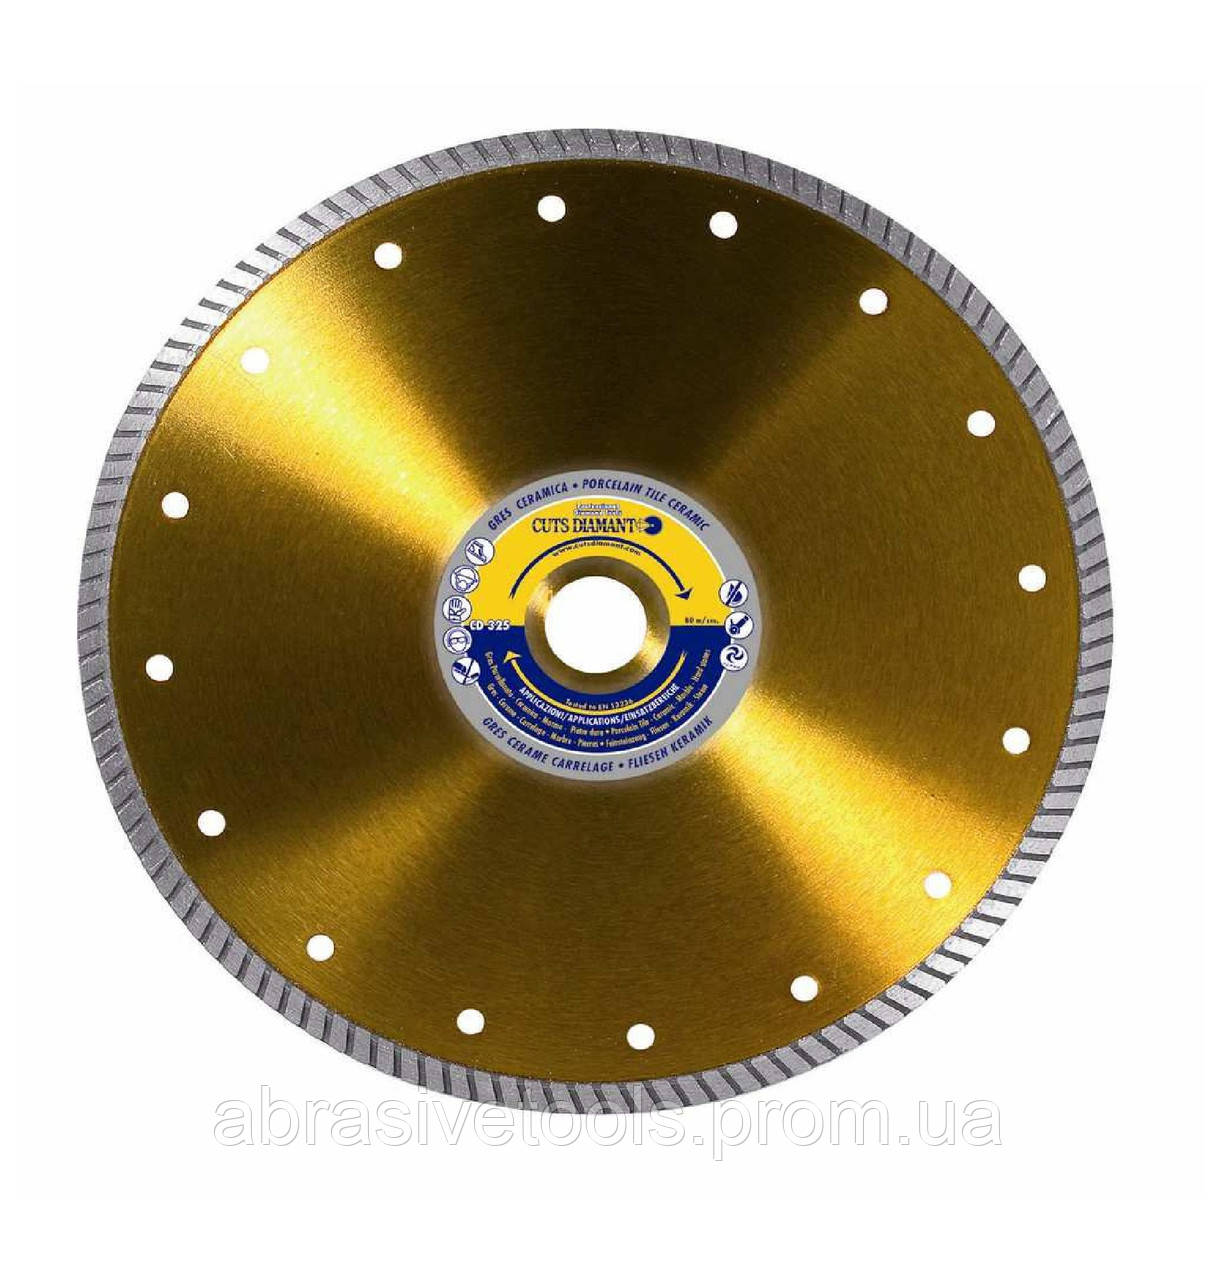 CD 325